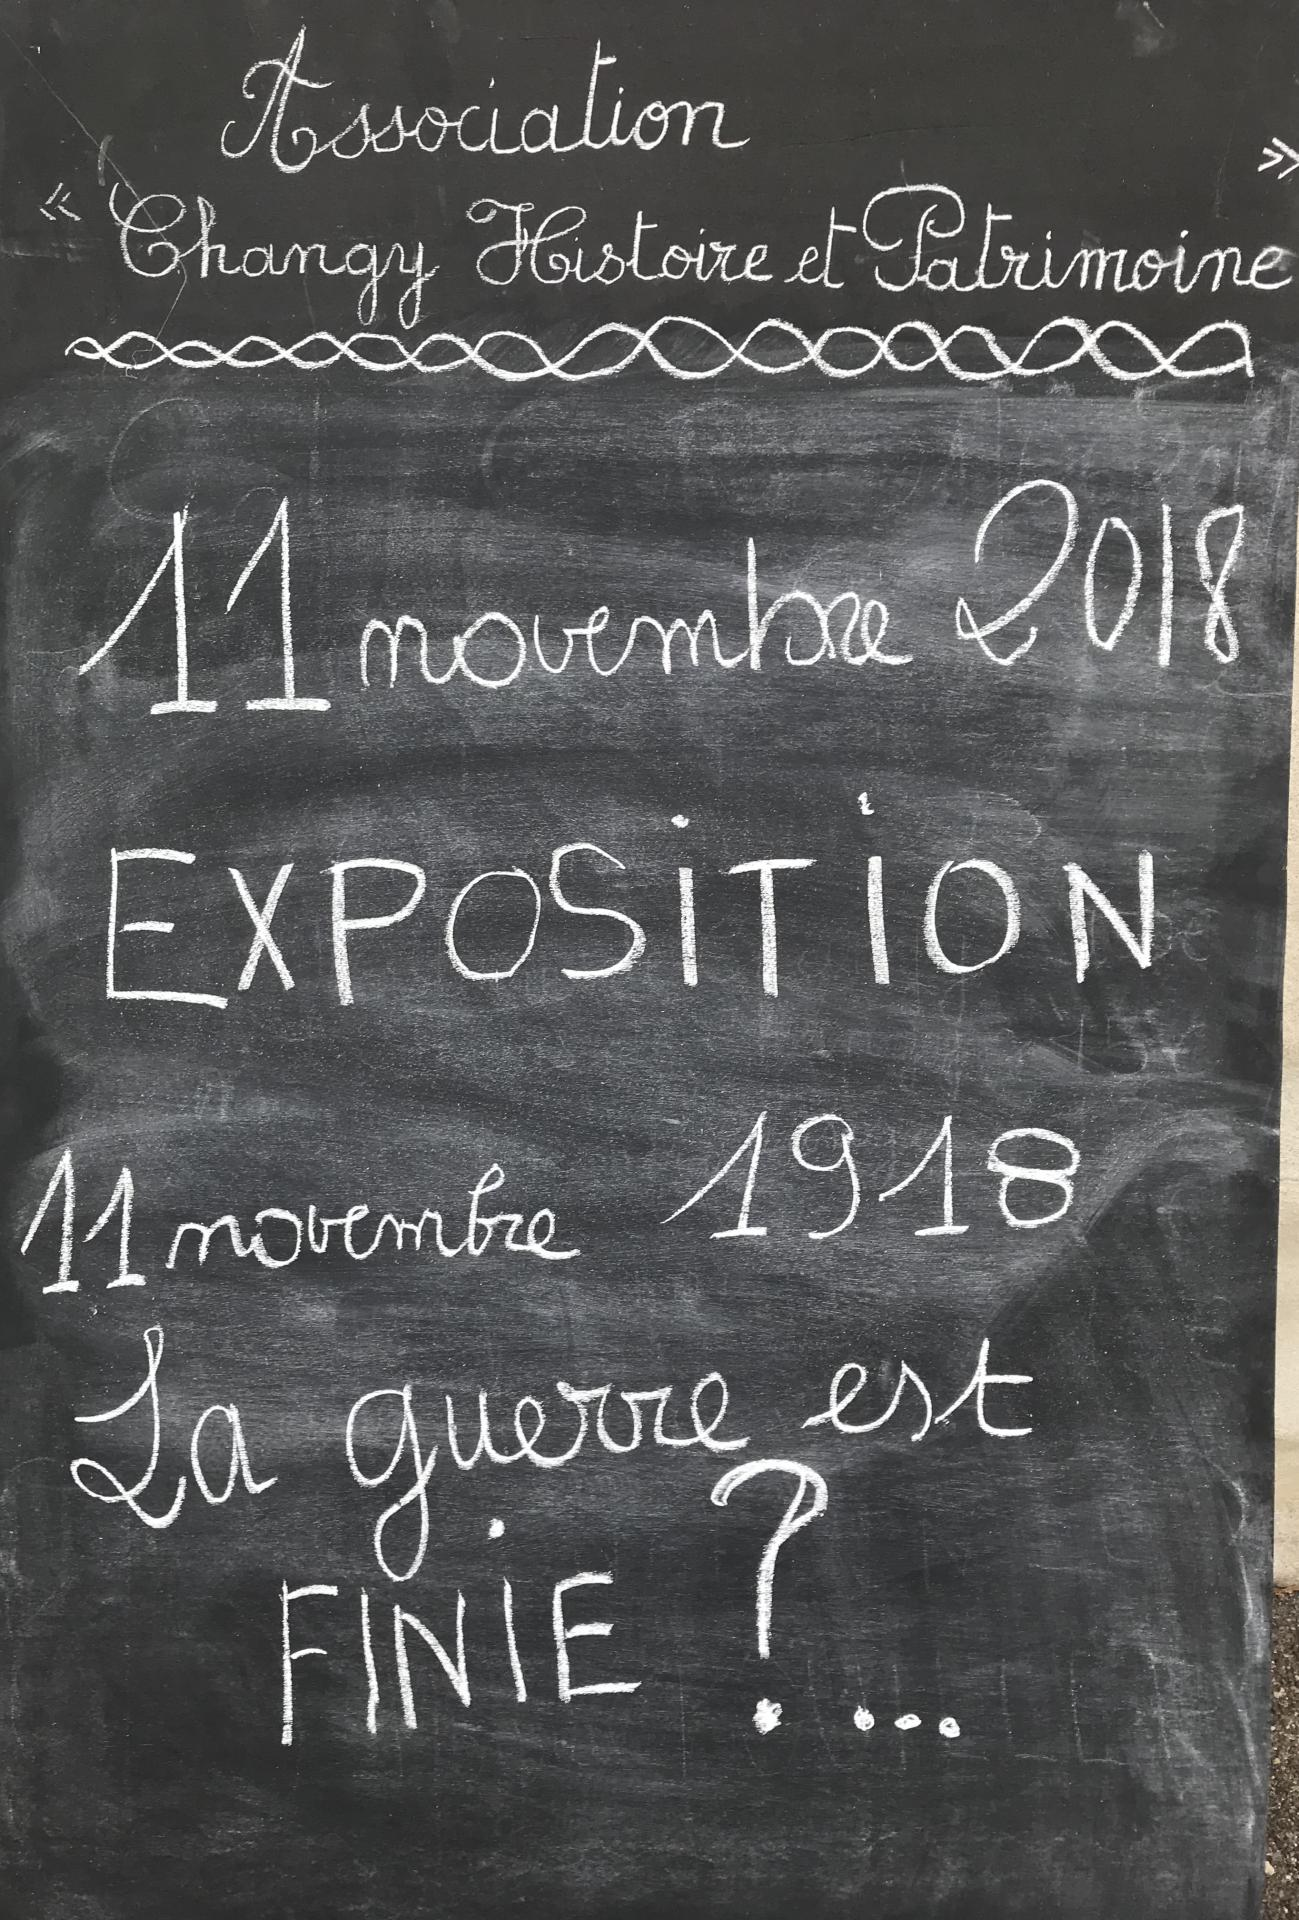 Centenaire 11 novembre 1918